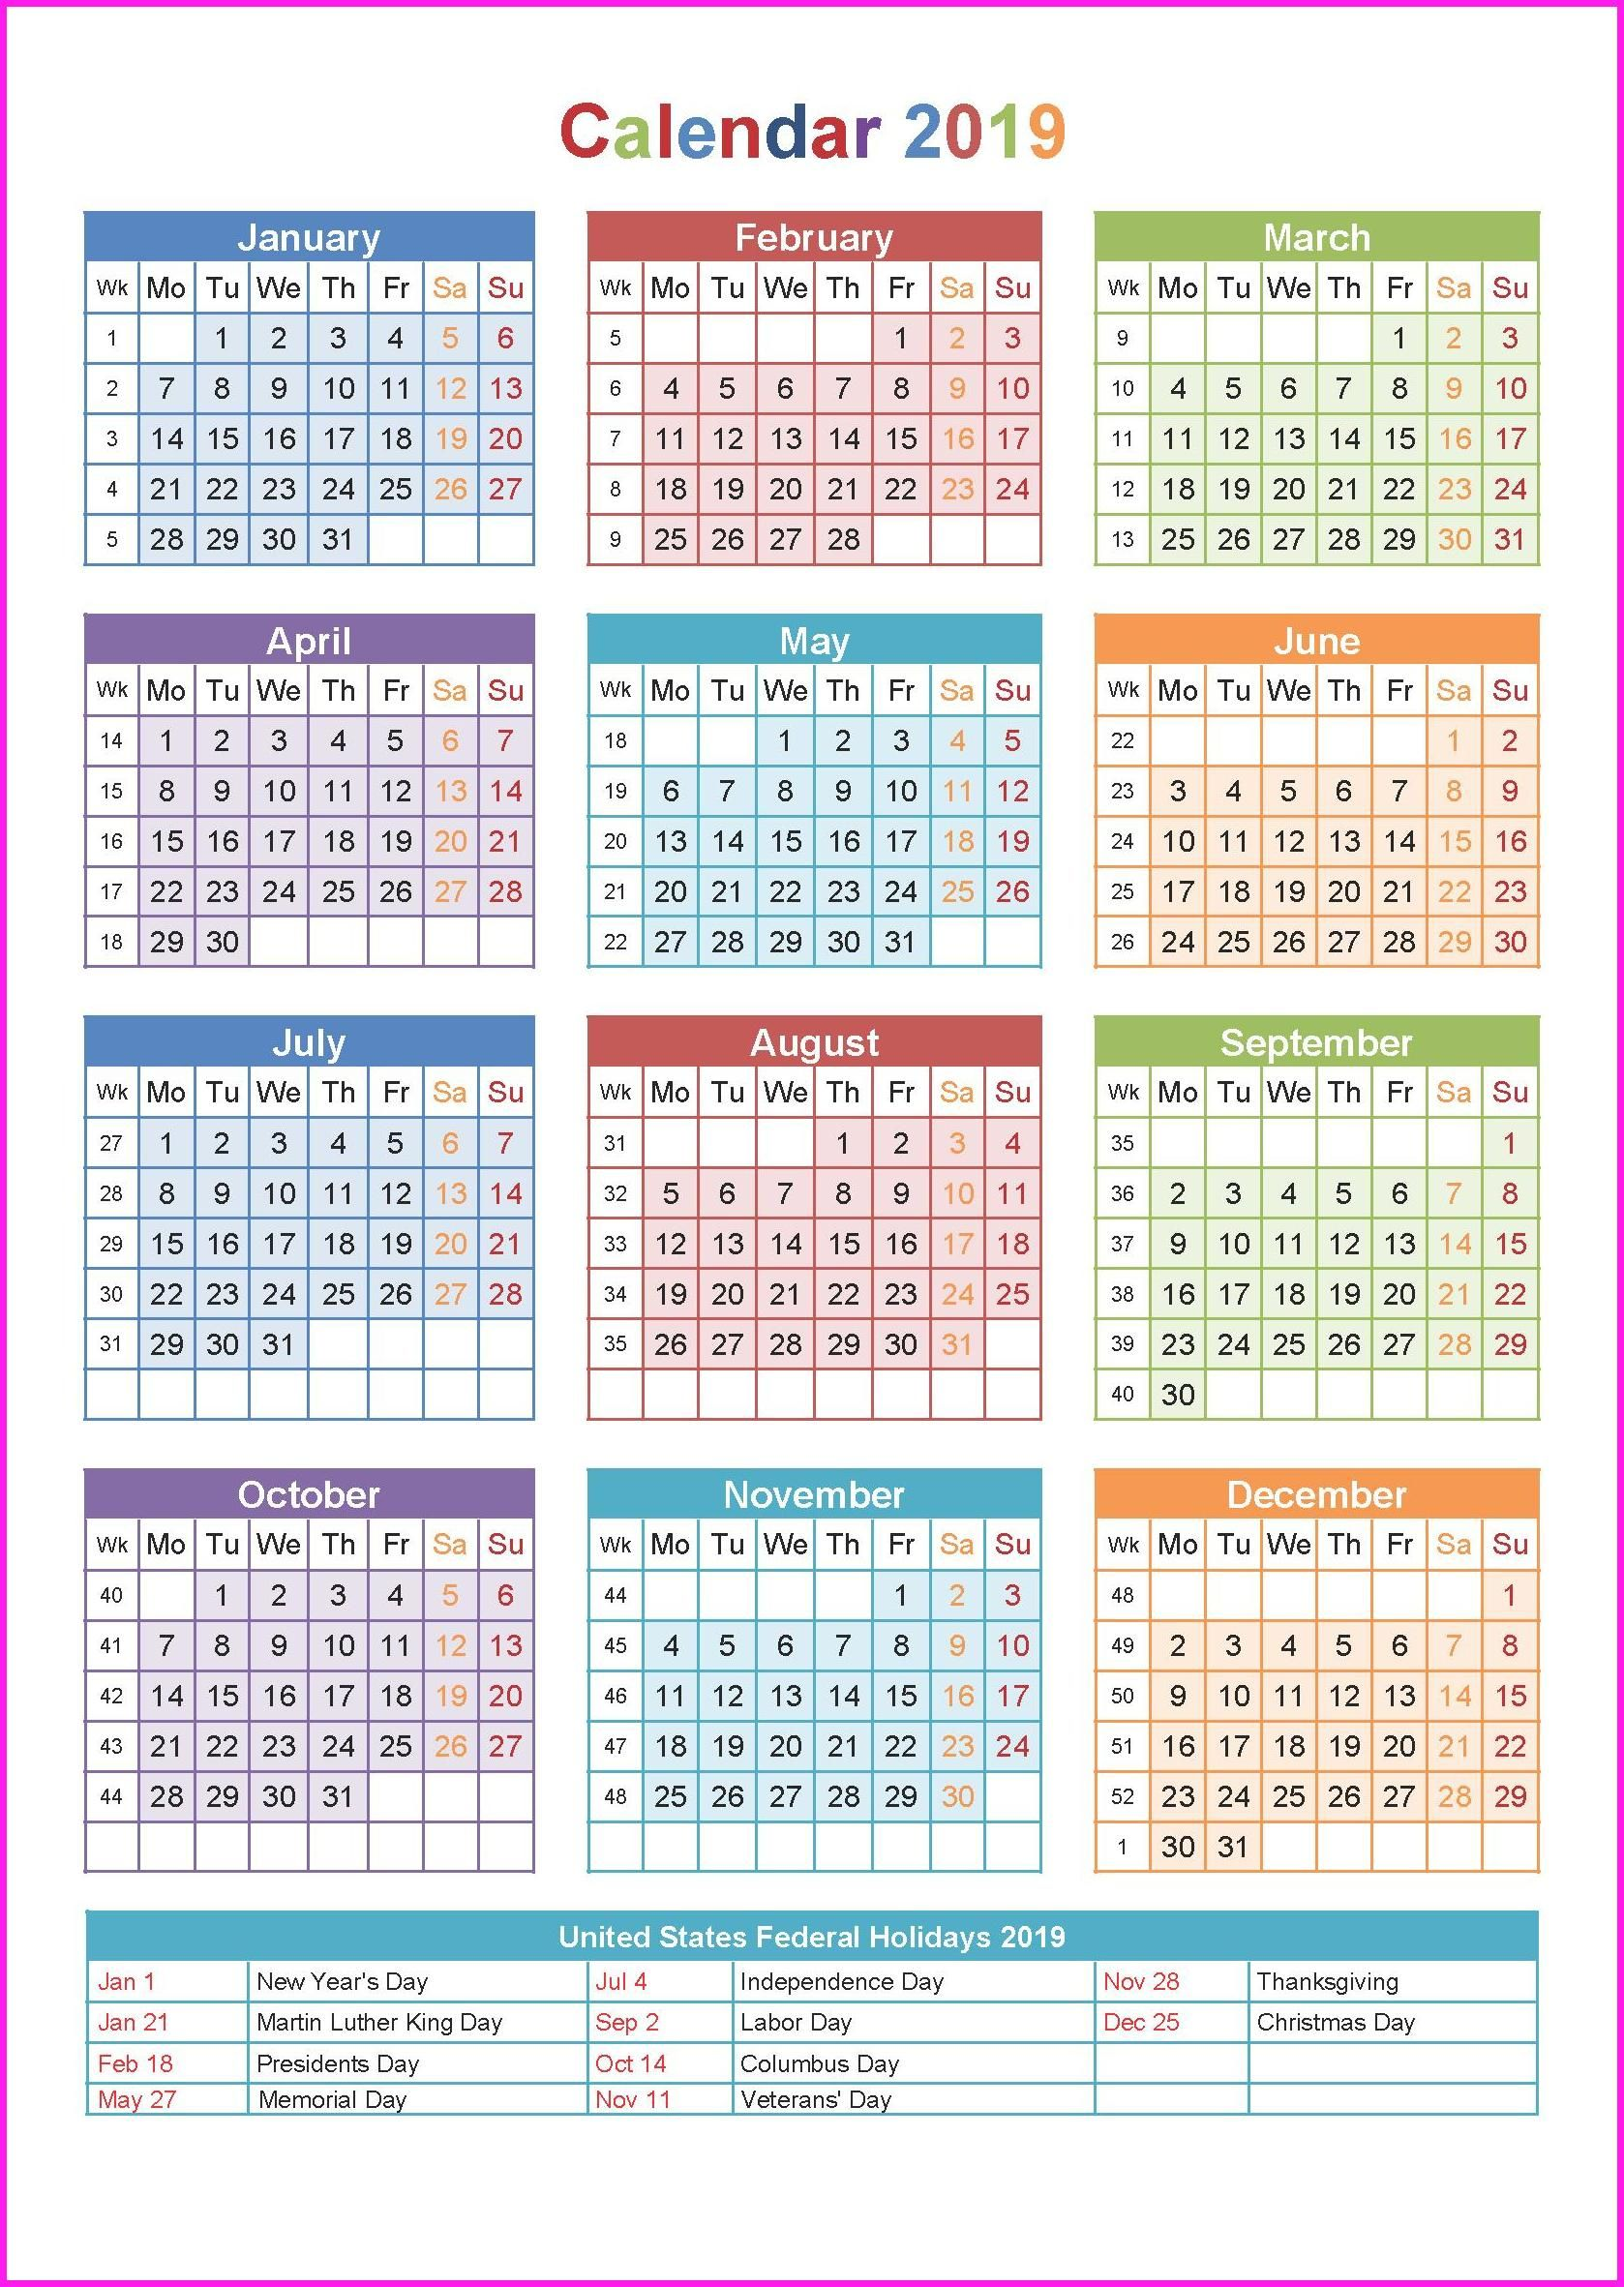 2019 holiday calendar usa calendar2019 printablecalendar holidays2019